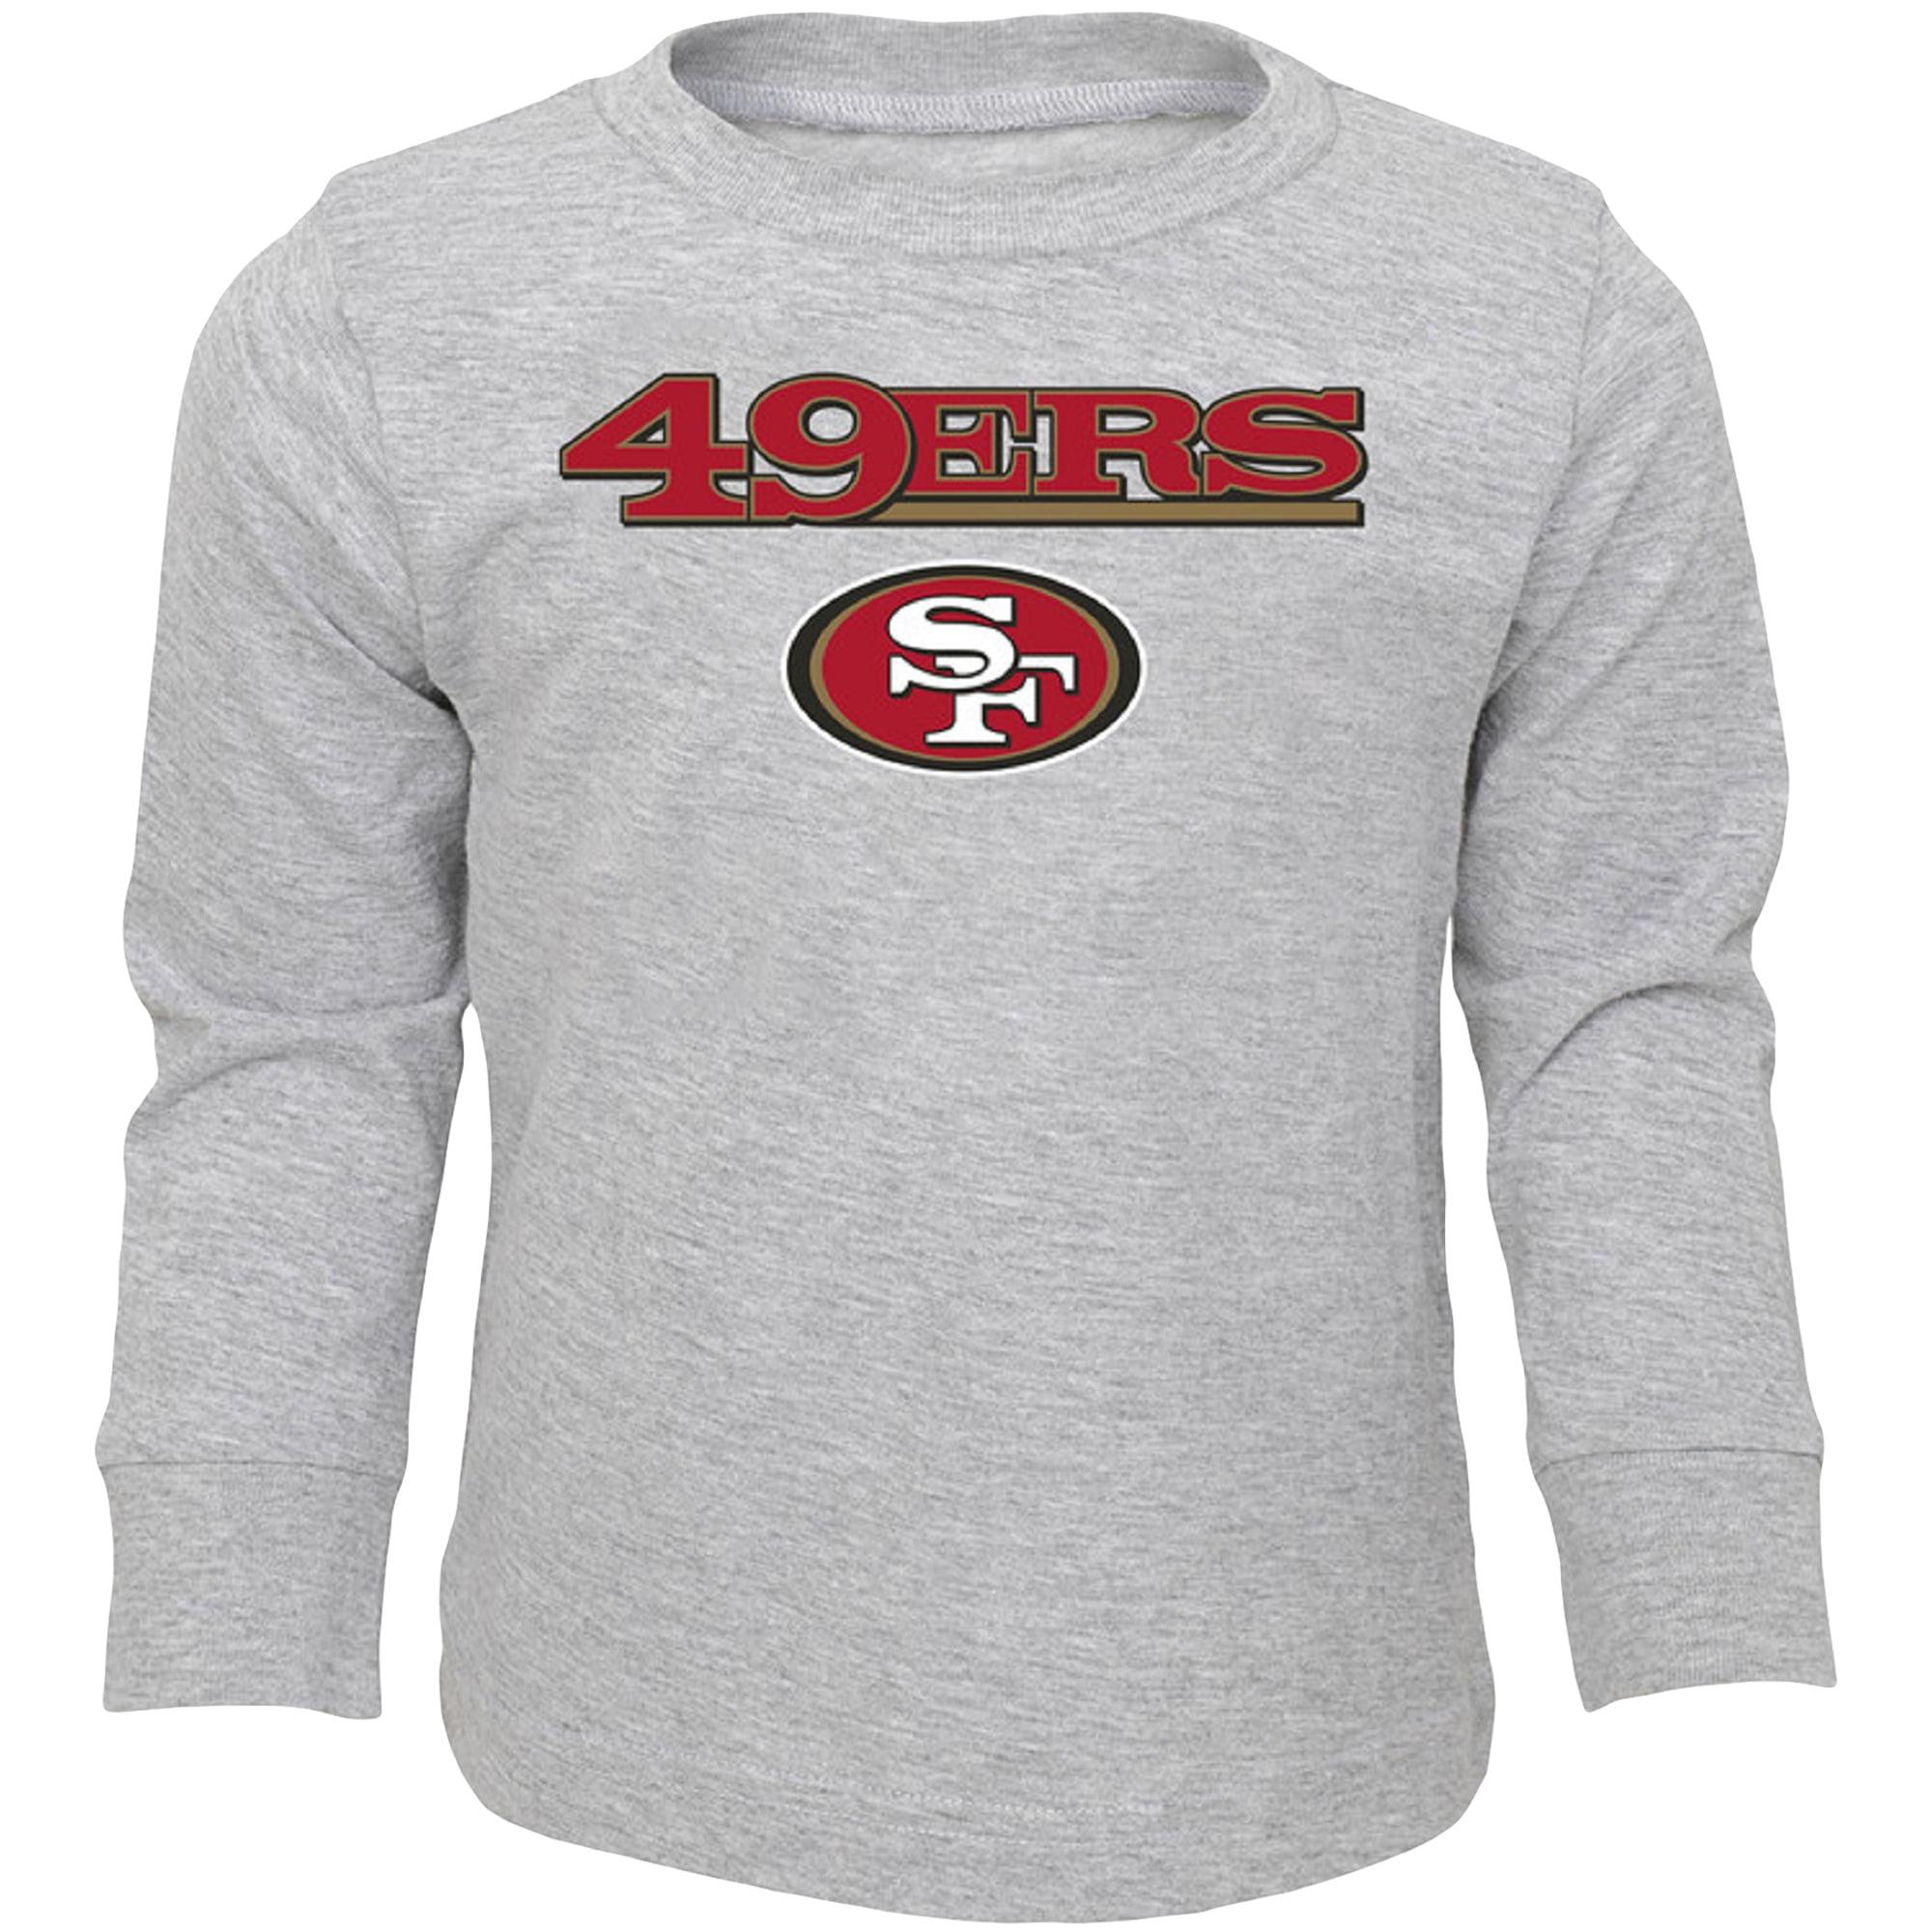 Infant Heathered Gray San Francisco 49ers Team Long Sleeve T-Shirt